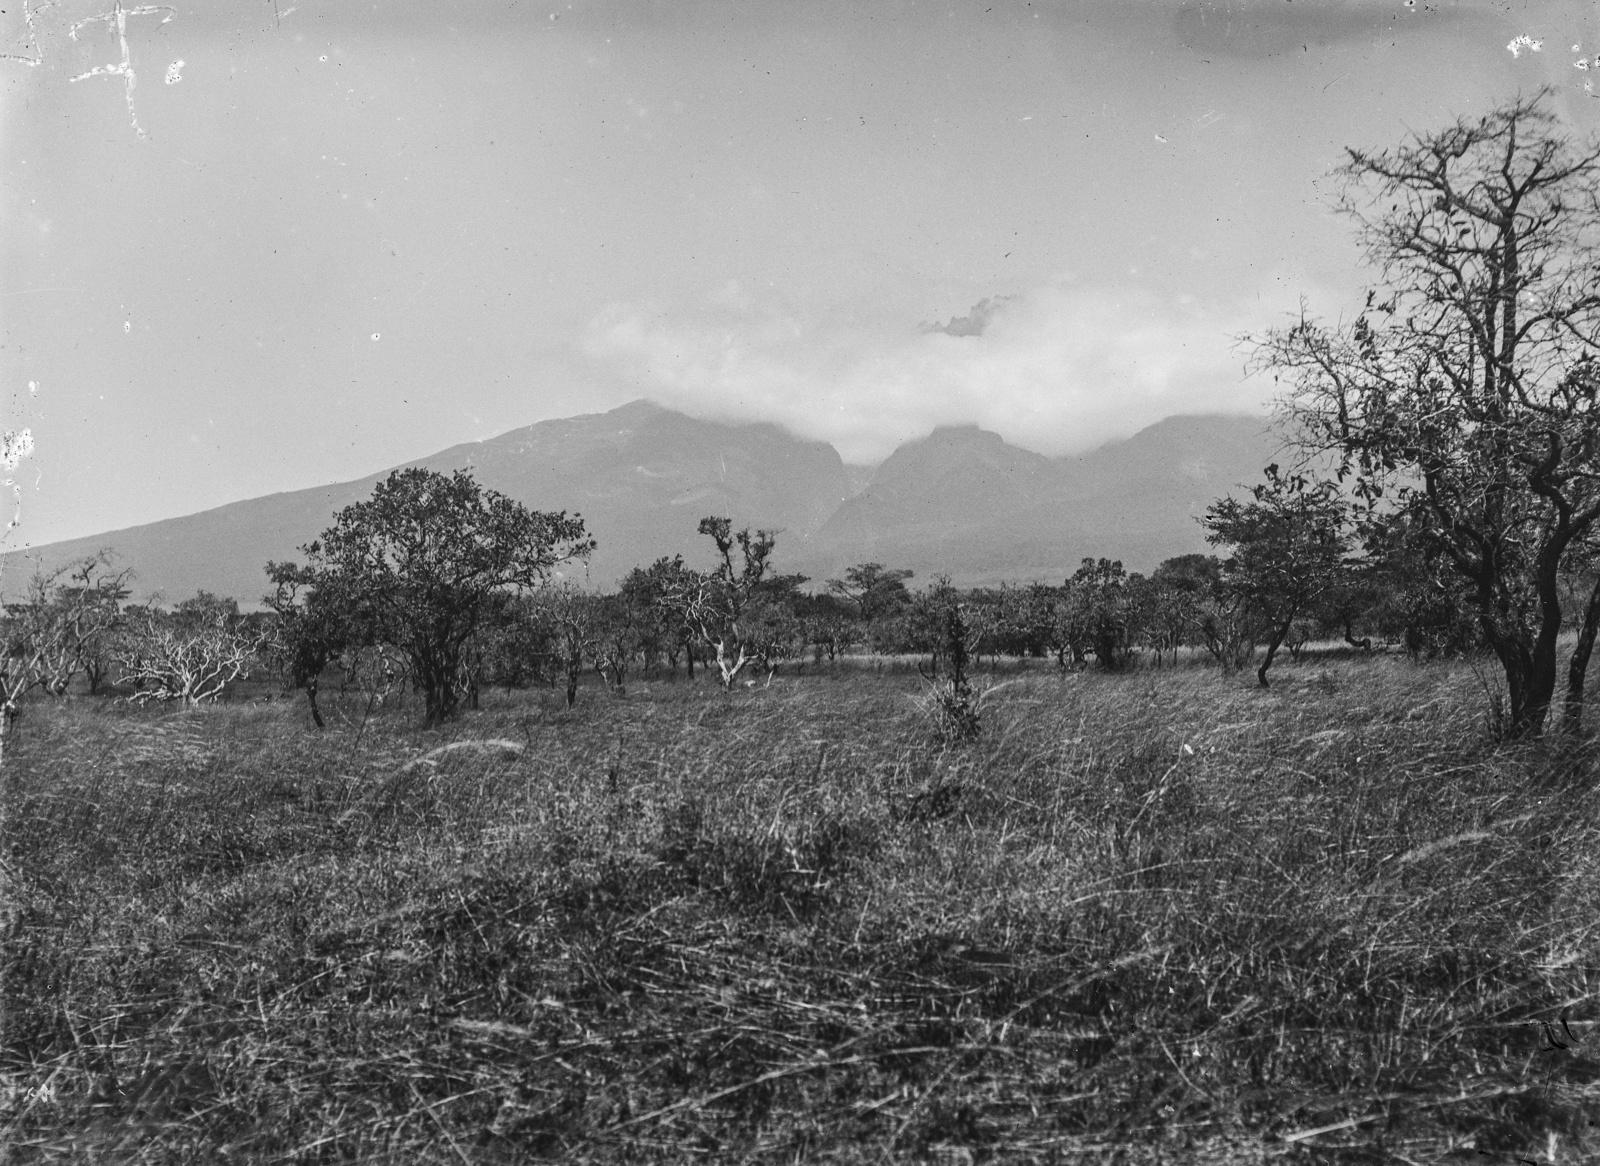 271. Пейзаж с Килиманджаро